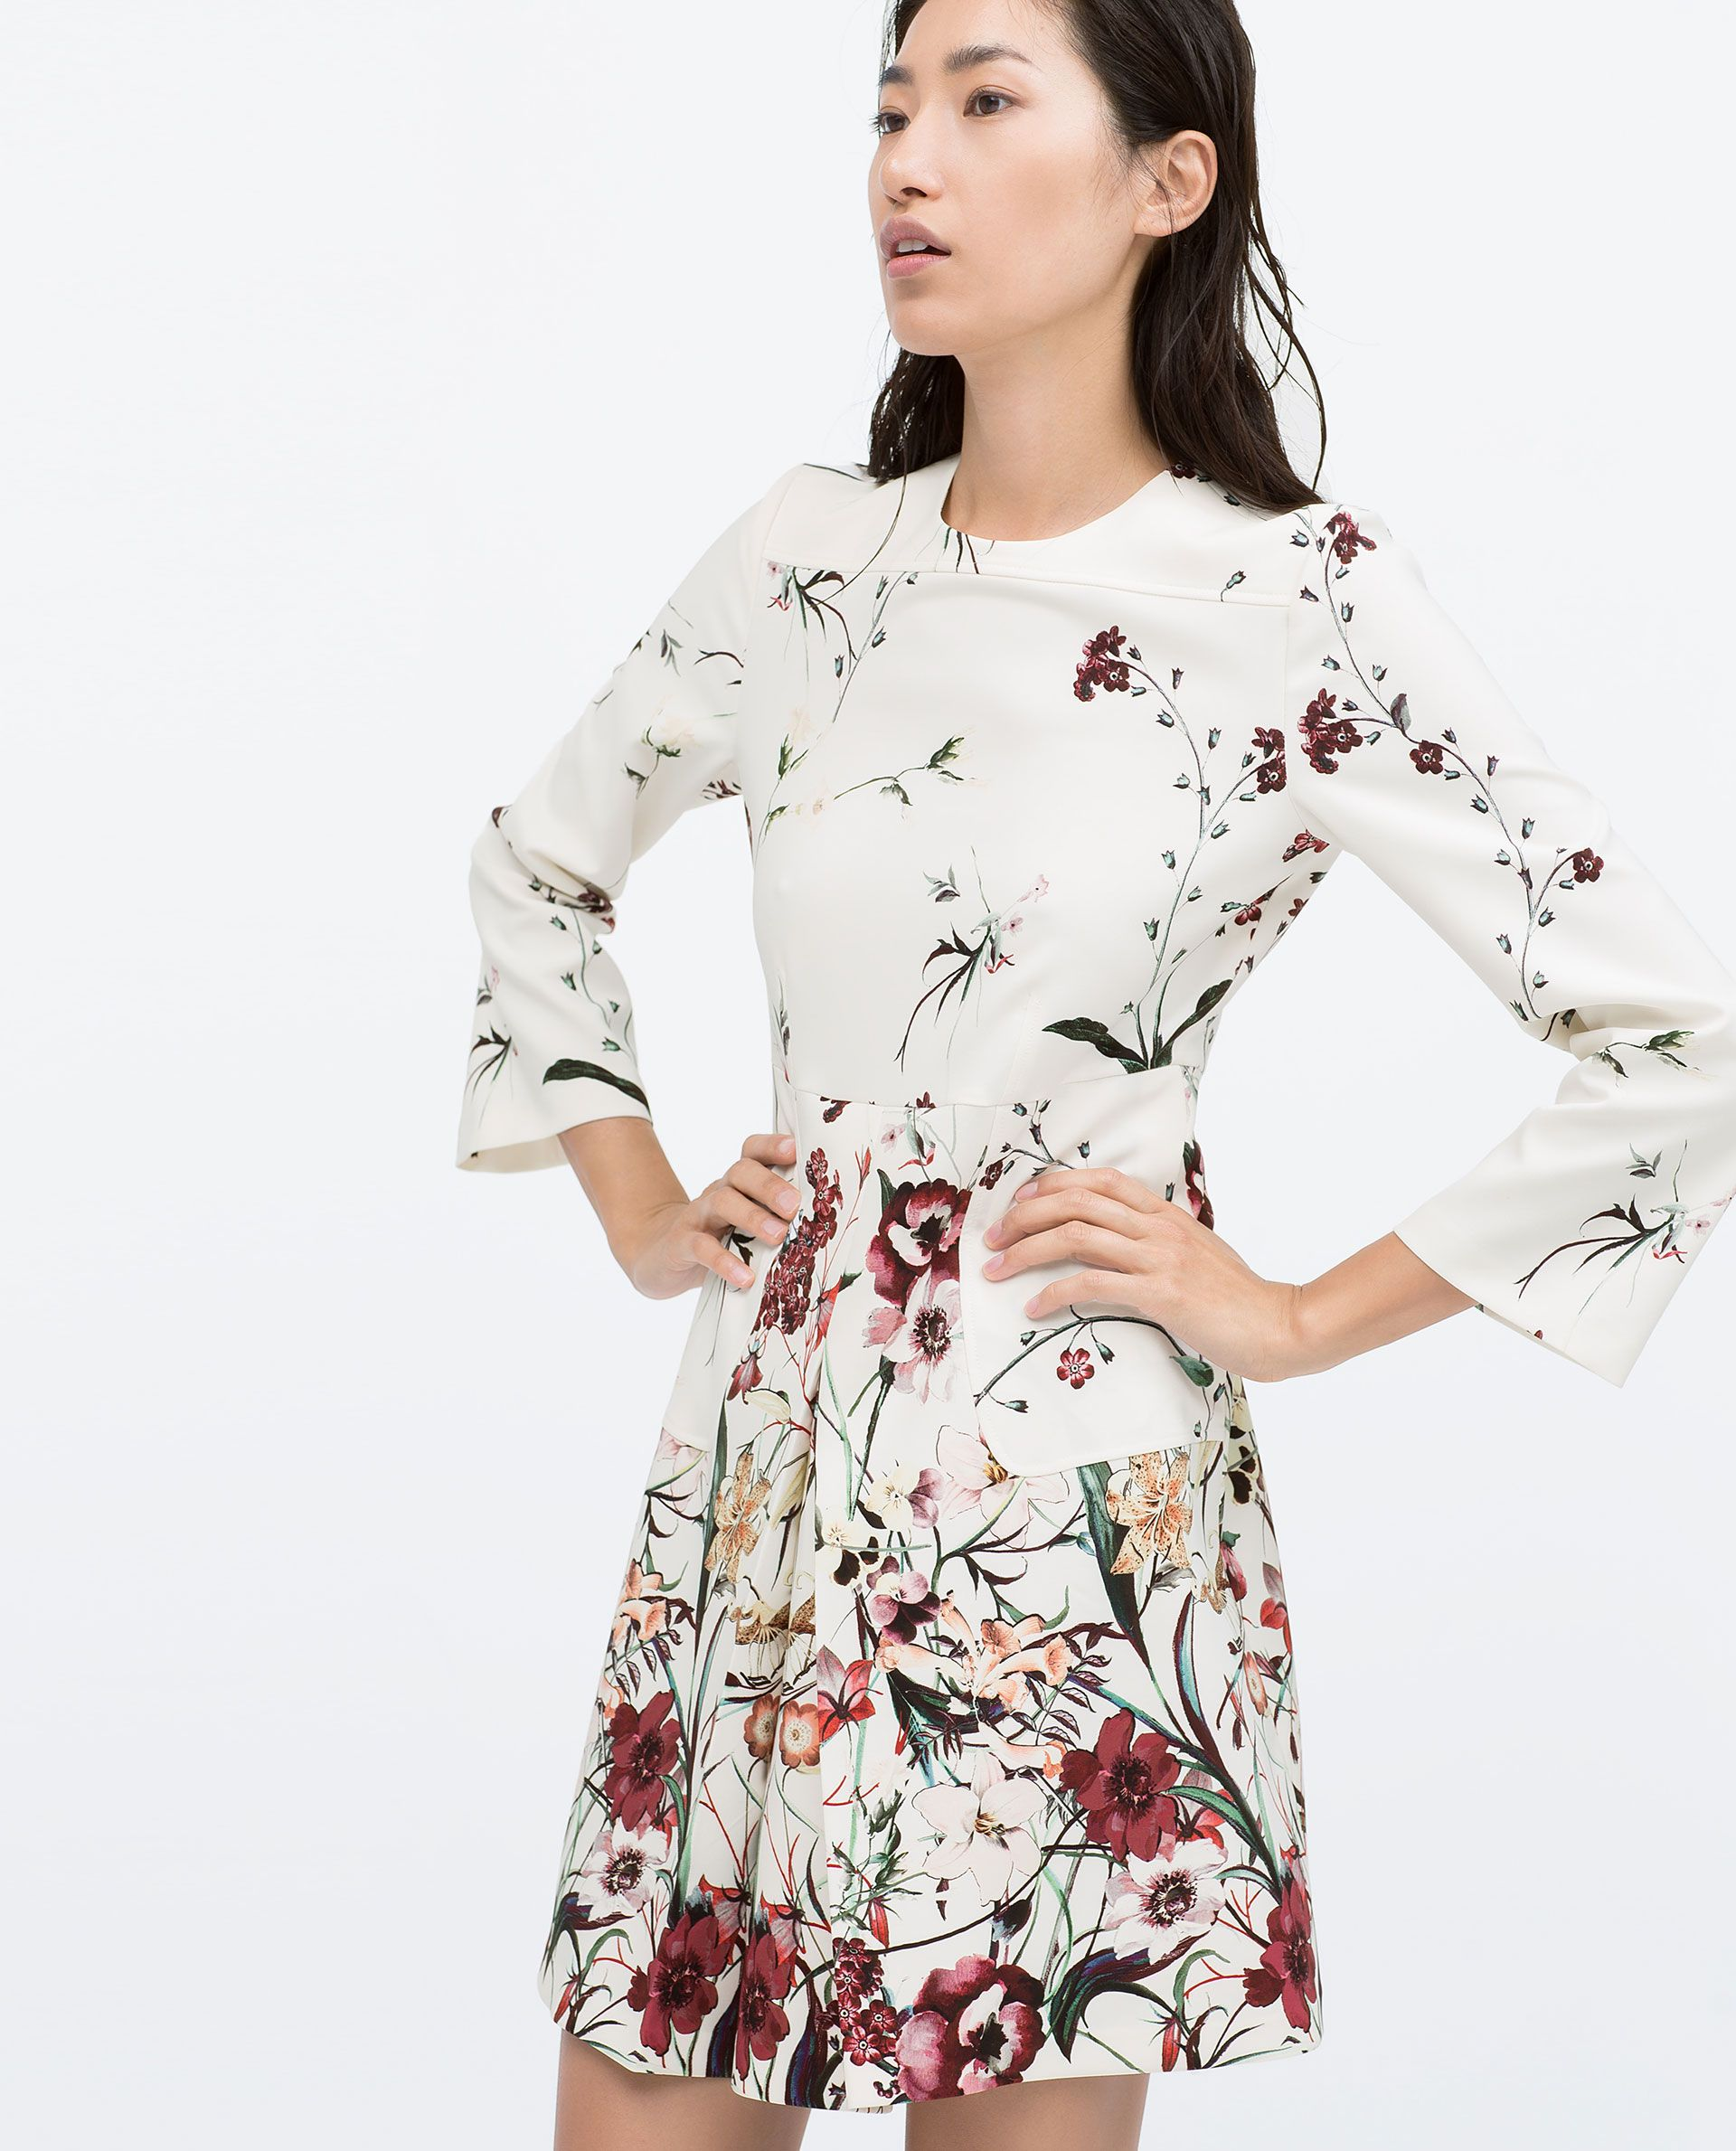 Zara Dresses 2015